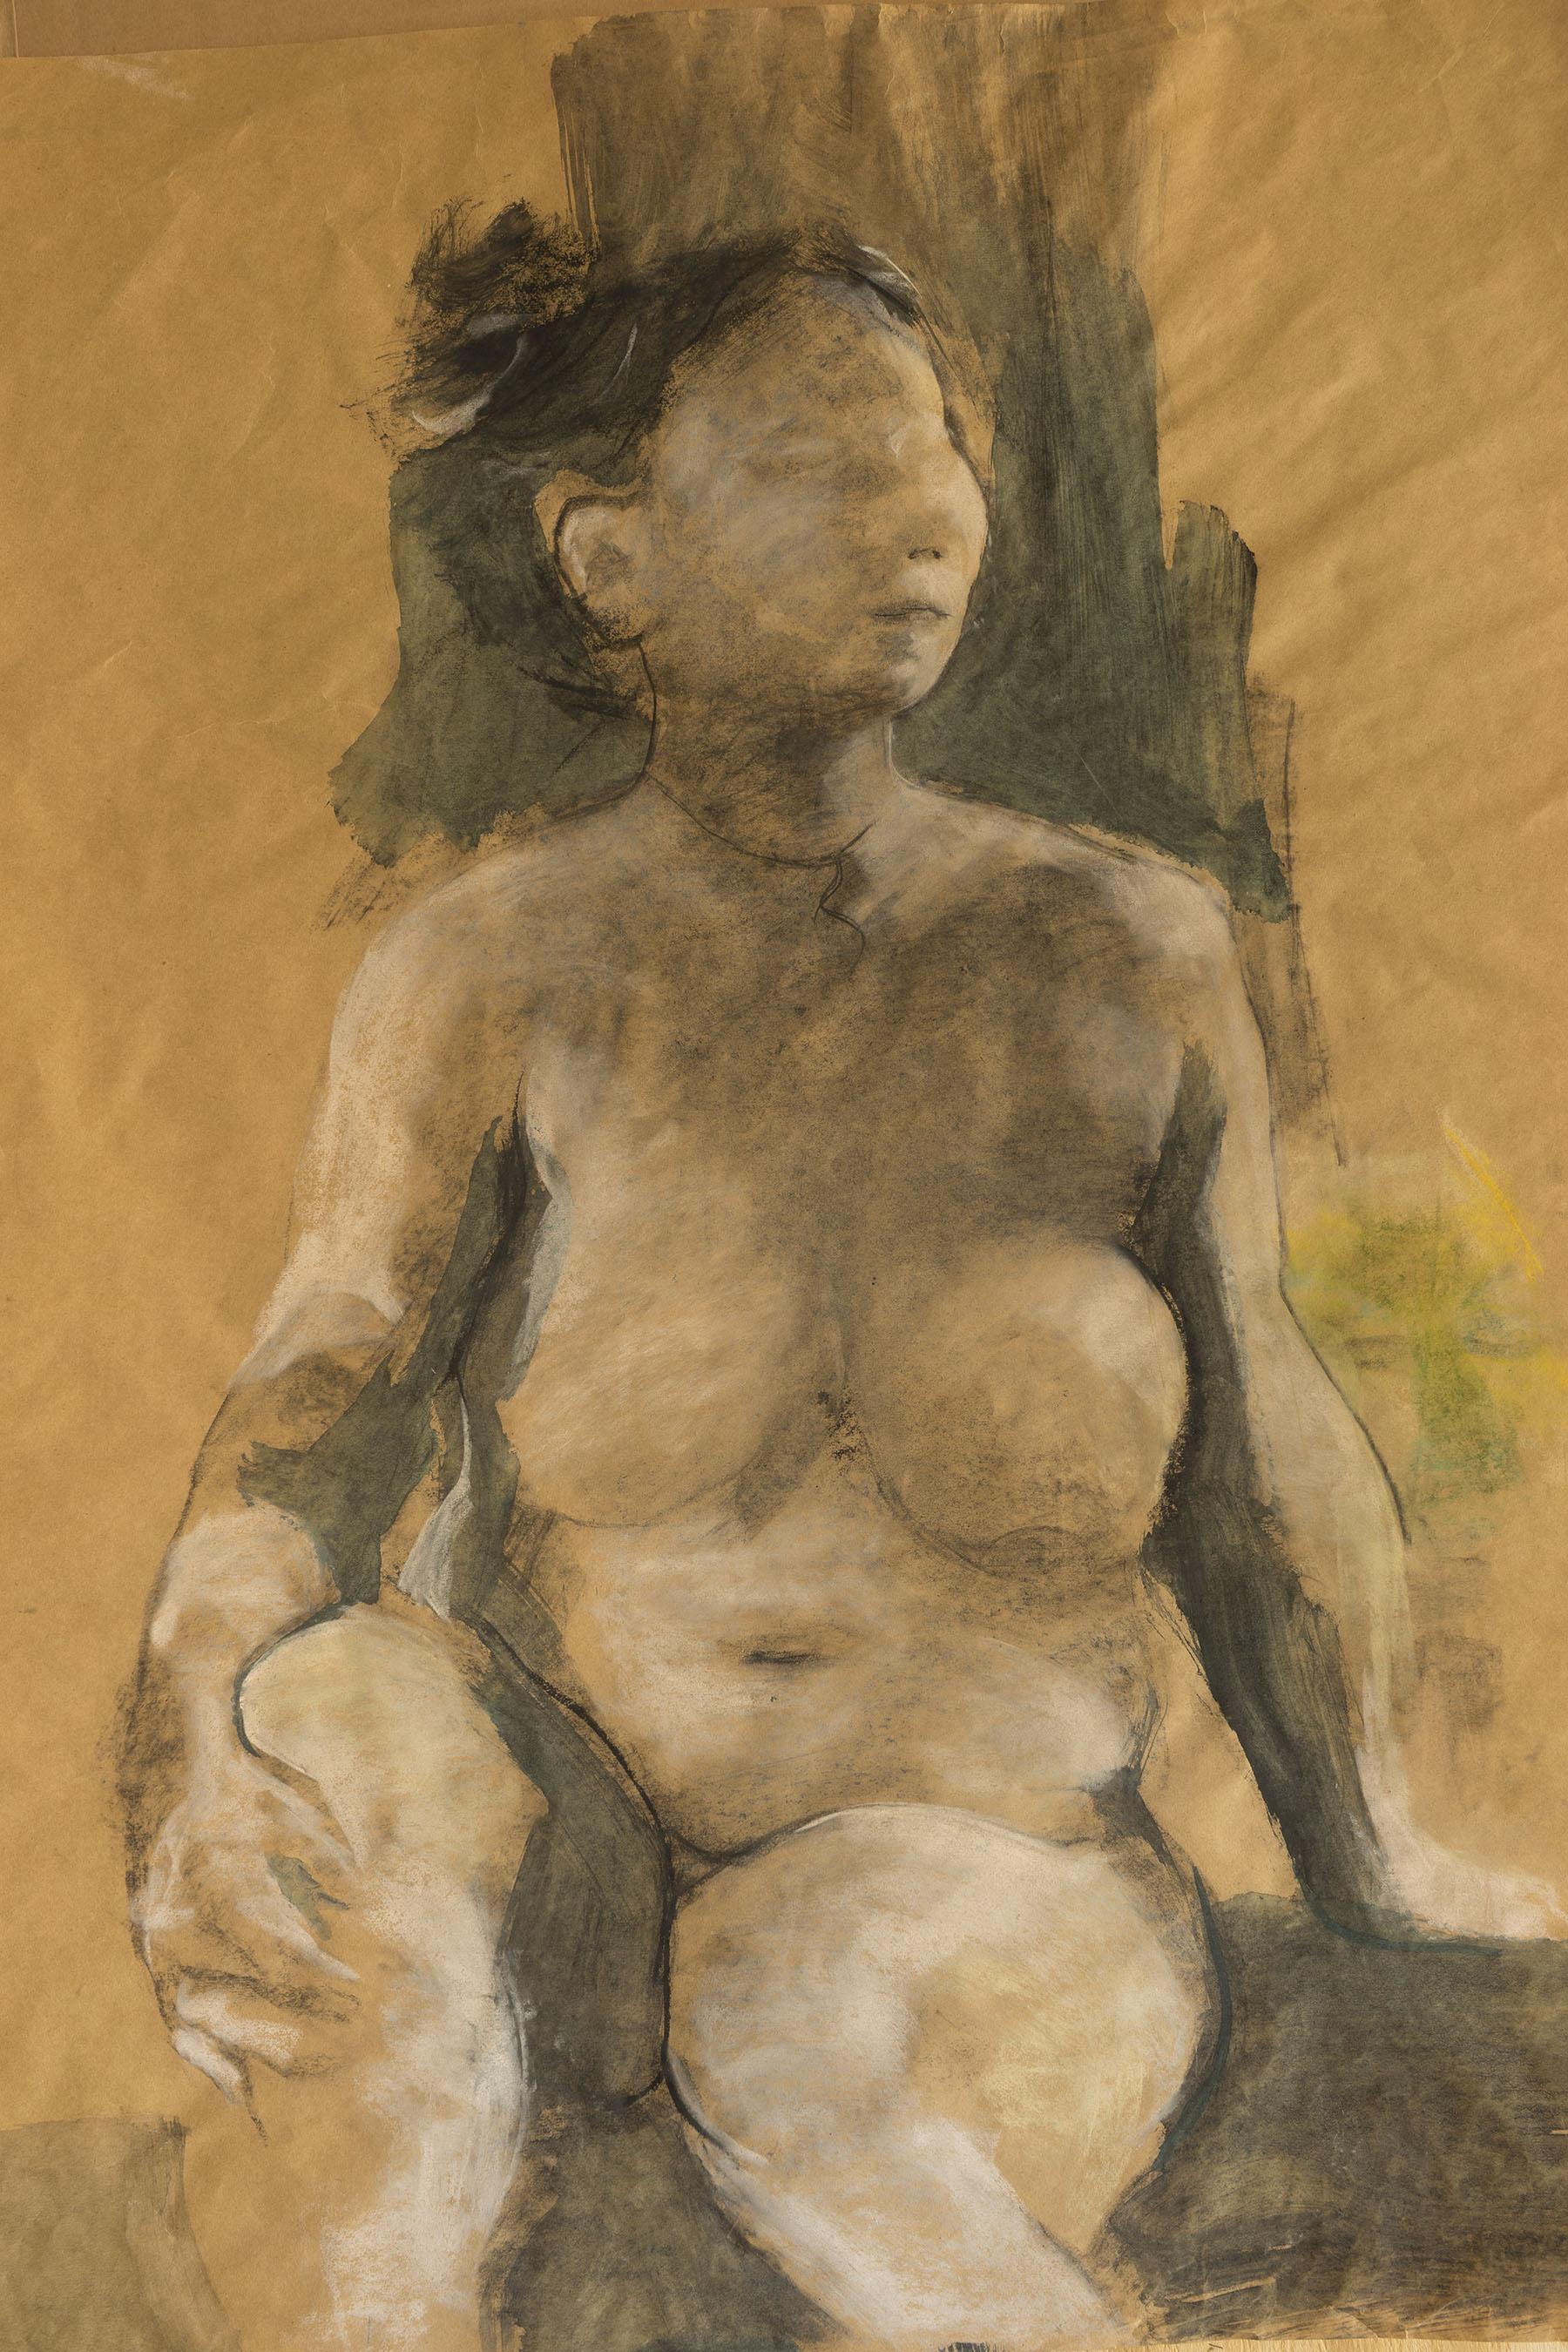 Figure_charcoal_chalk_wash_03_05293.jpg